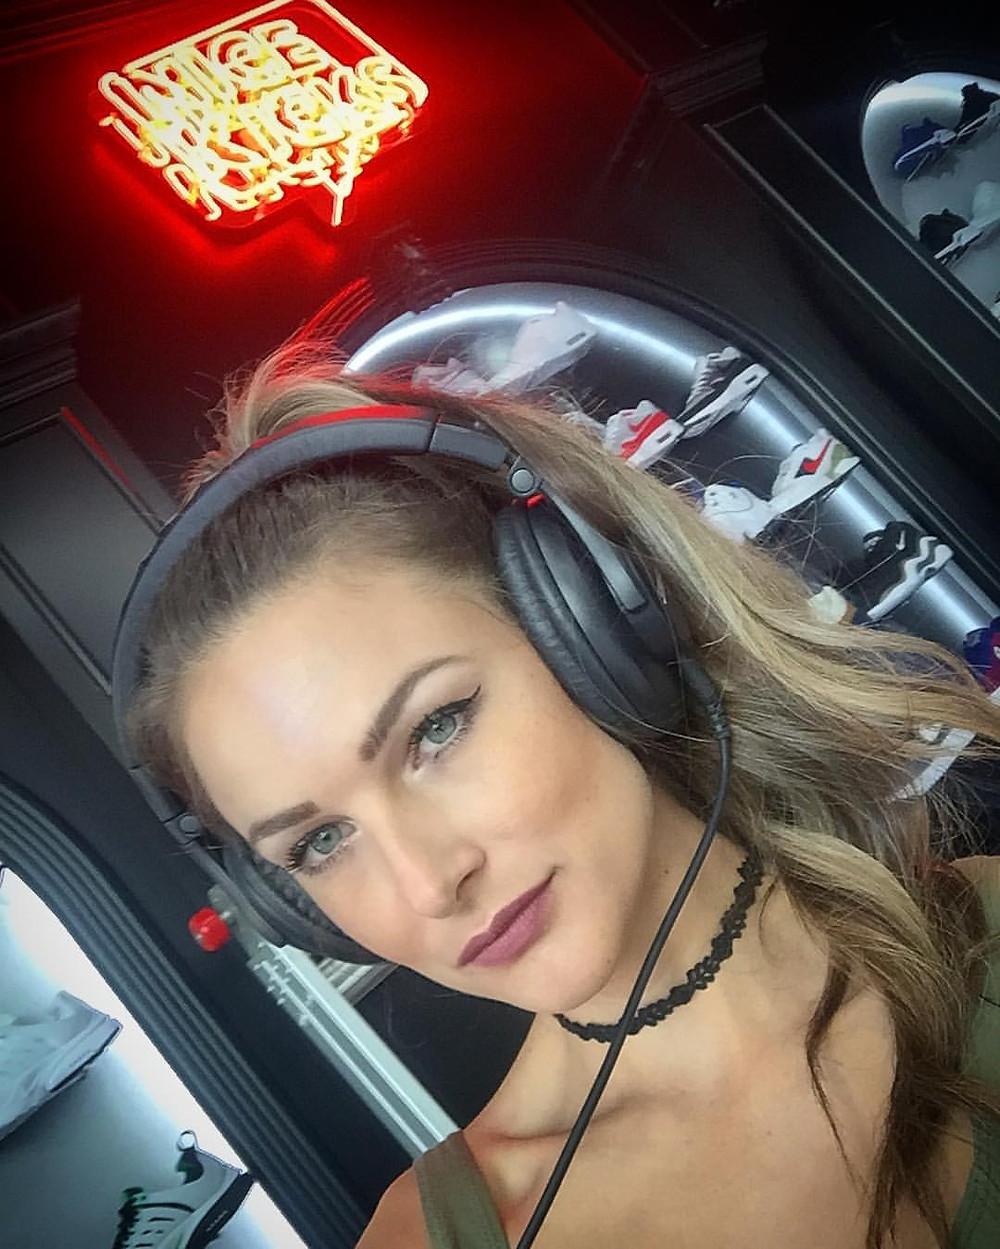 DJ Bad Ash at Nice Kicks launch event DTLA